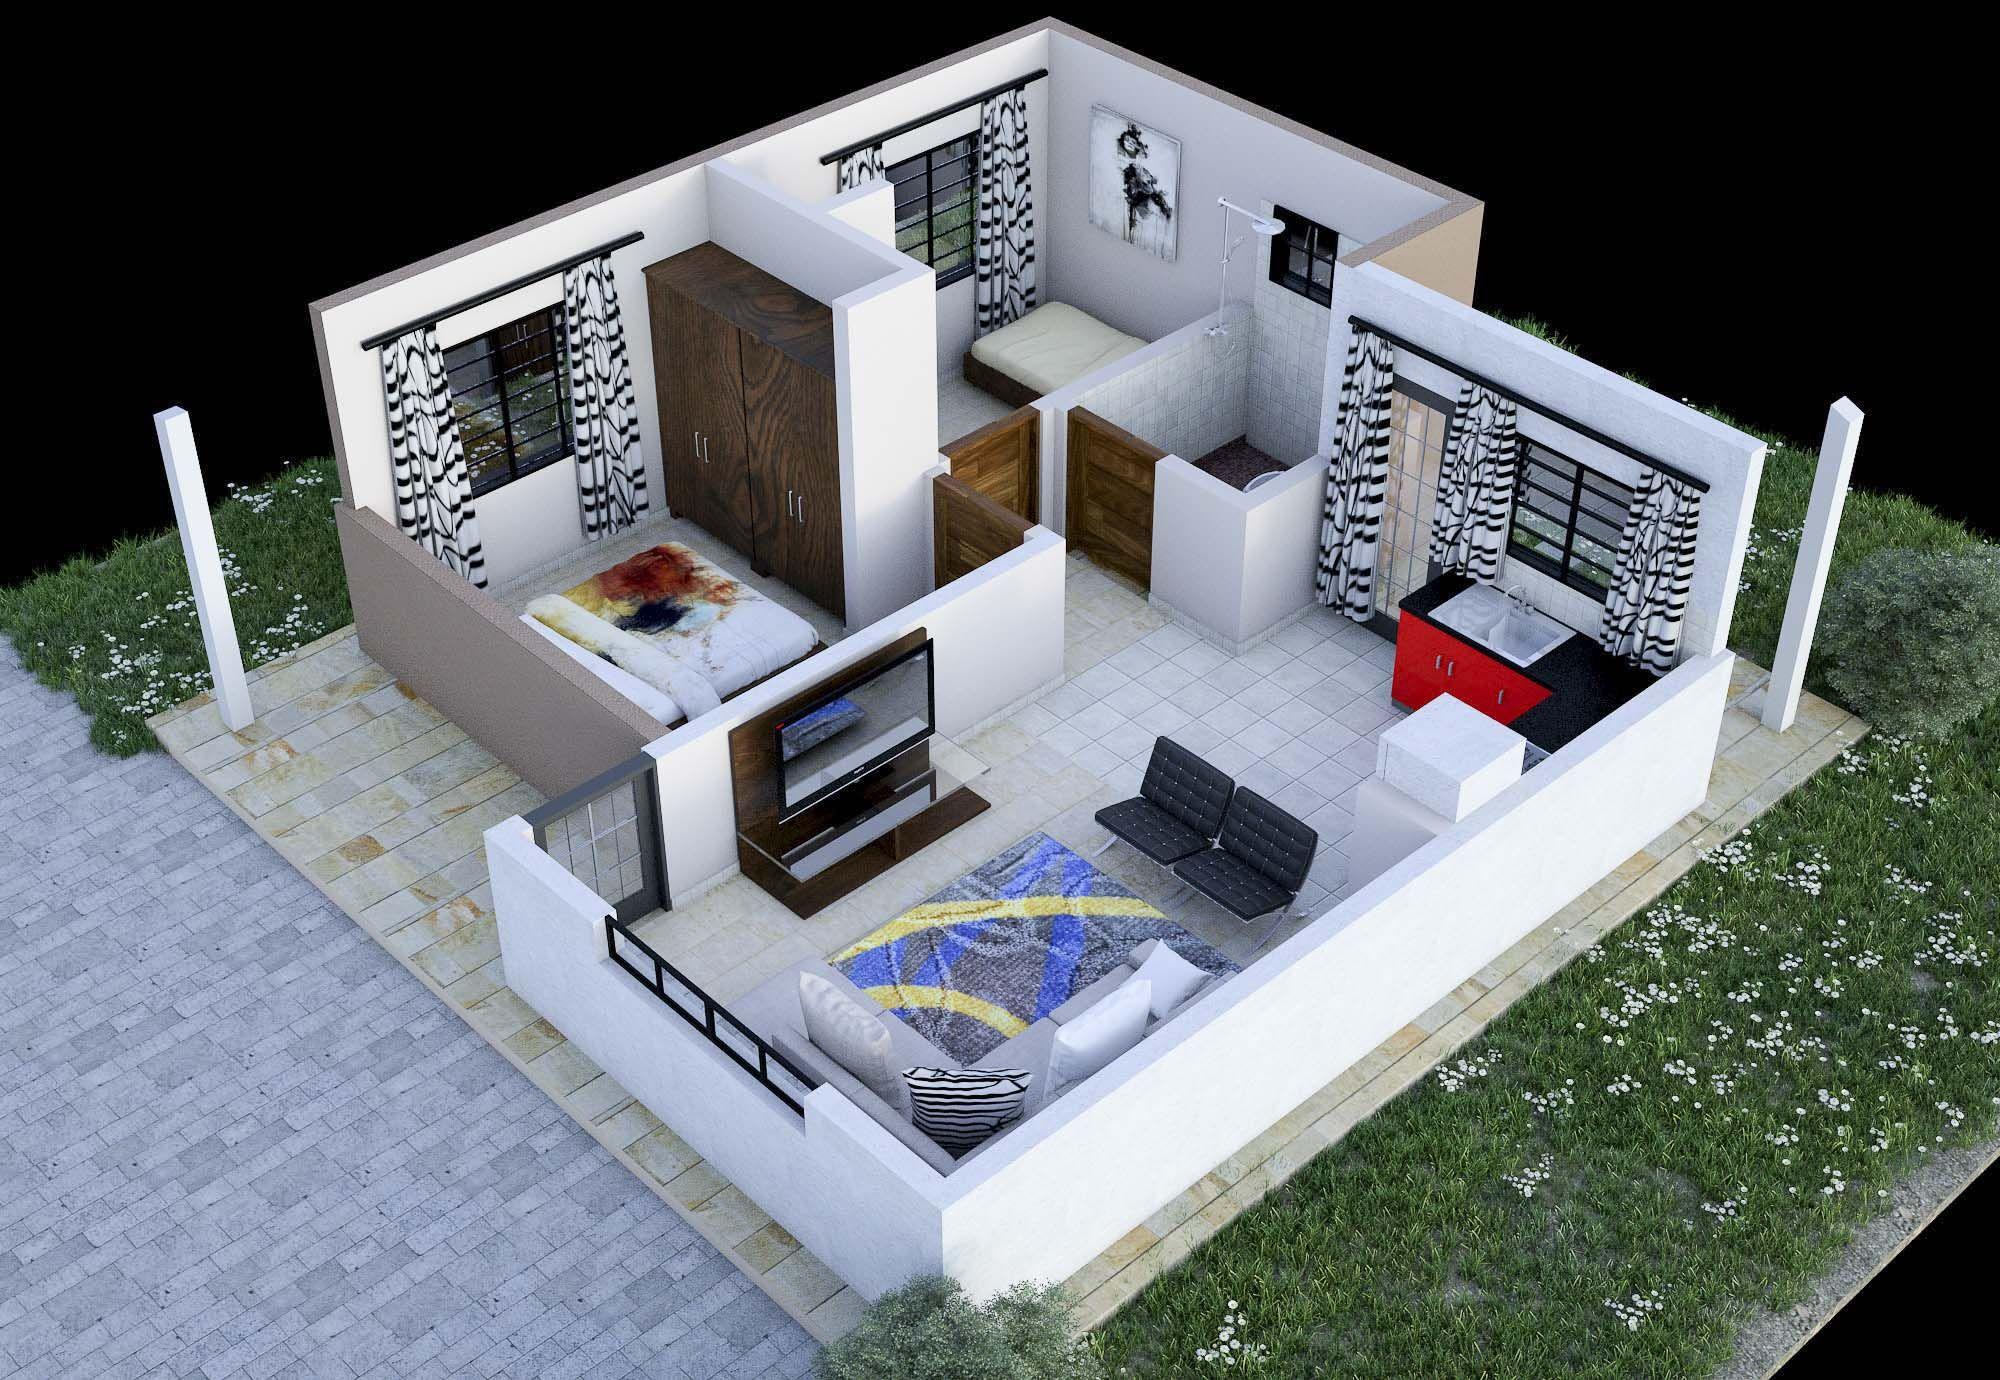 KOTO Housing Kenya - Koto house designs | House design, My ...